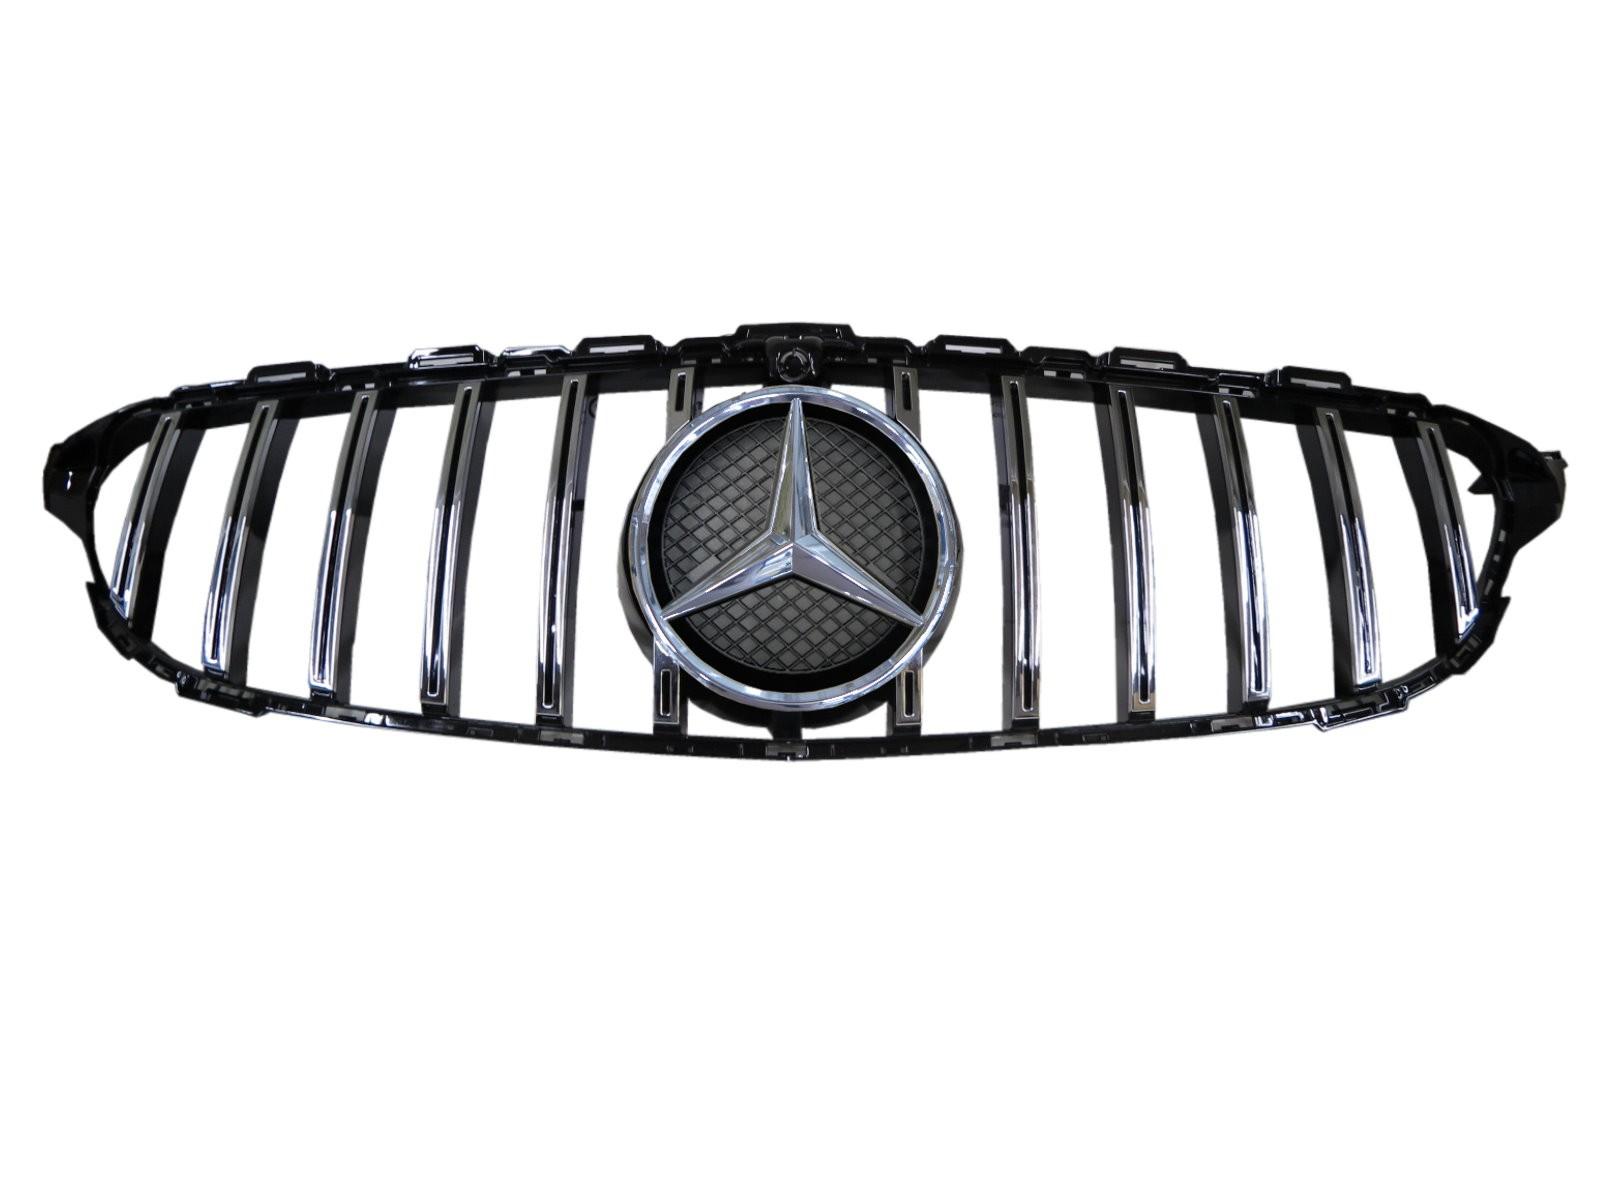 CrazyTheGod C-CLASS W205 2014-2018 Pre-Facelift Sedan 4D Star Emblem GRILLE/GRILL Chrome for Mercedes-Benz